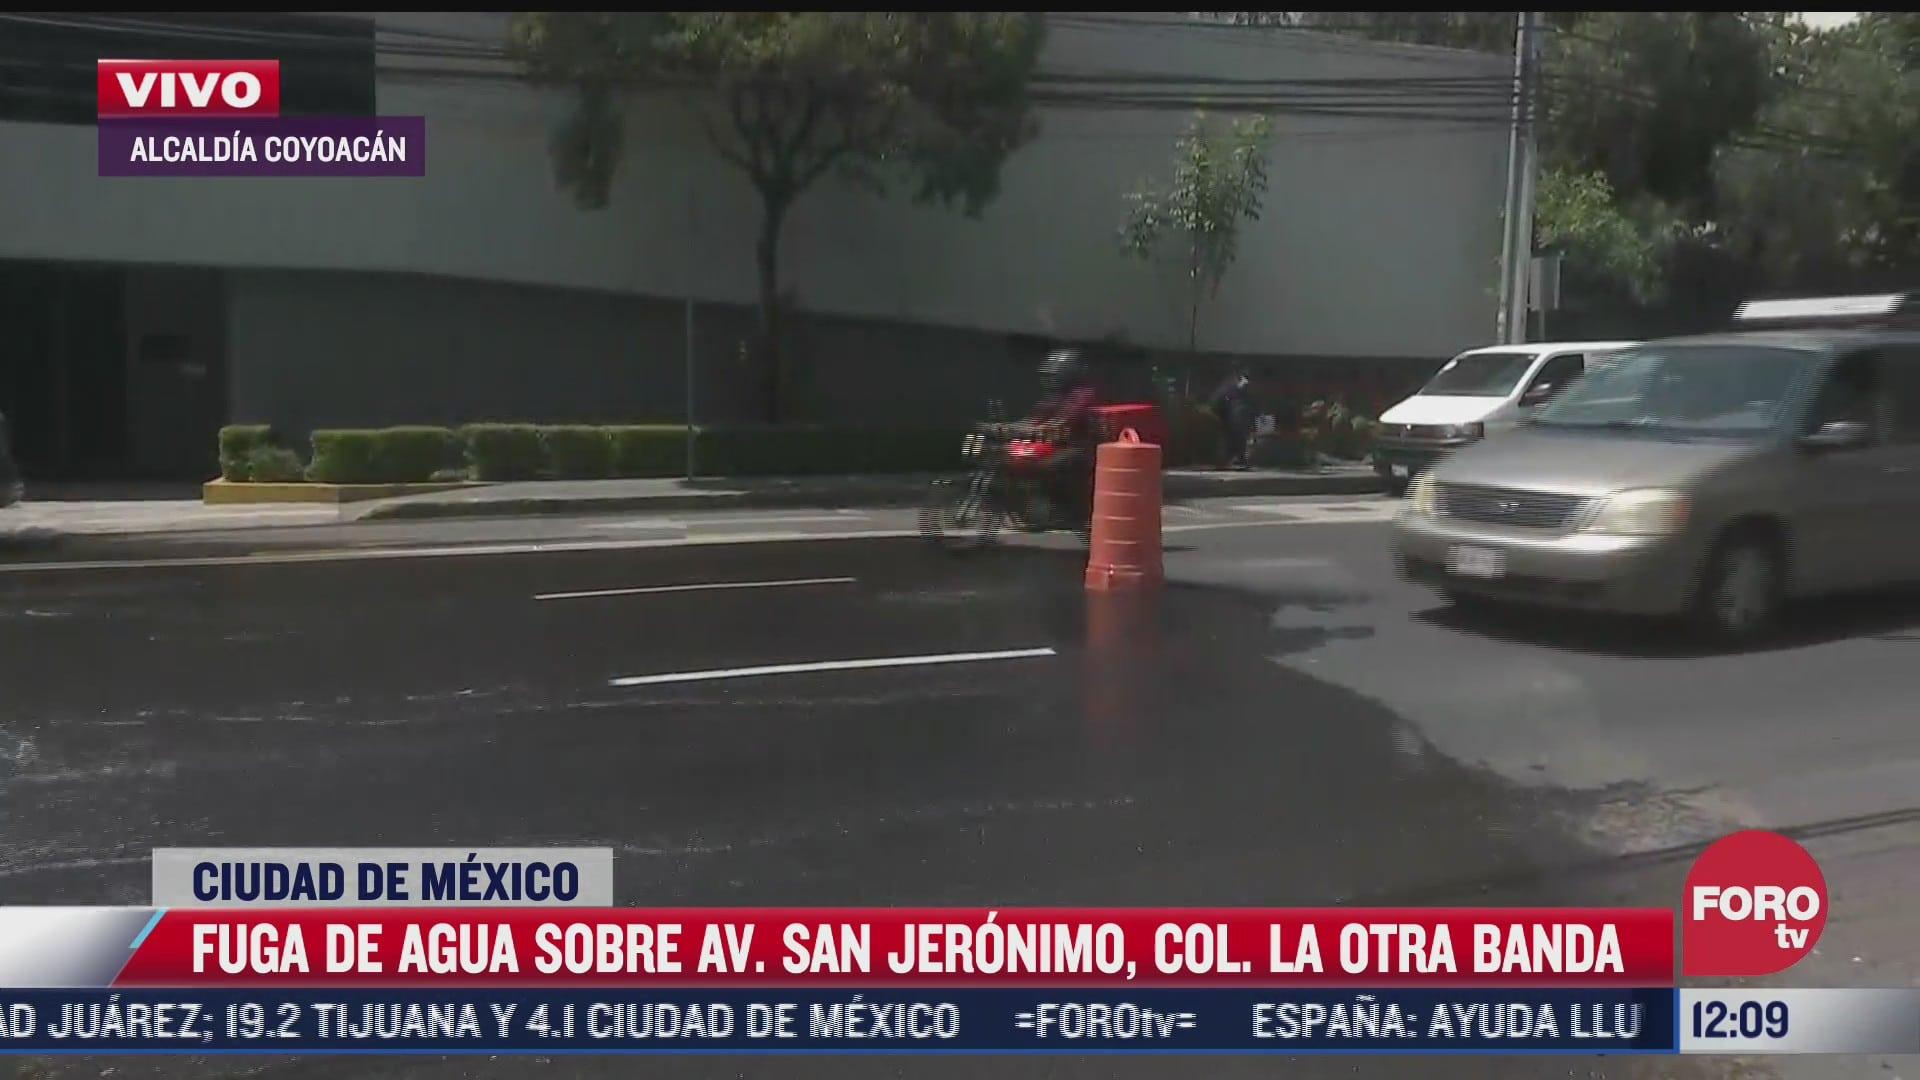 se registra fuga de agua en avenida san jeronimo alcaldia coyoacan